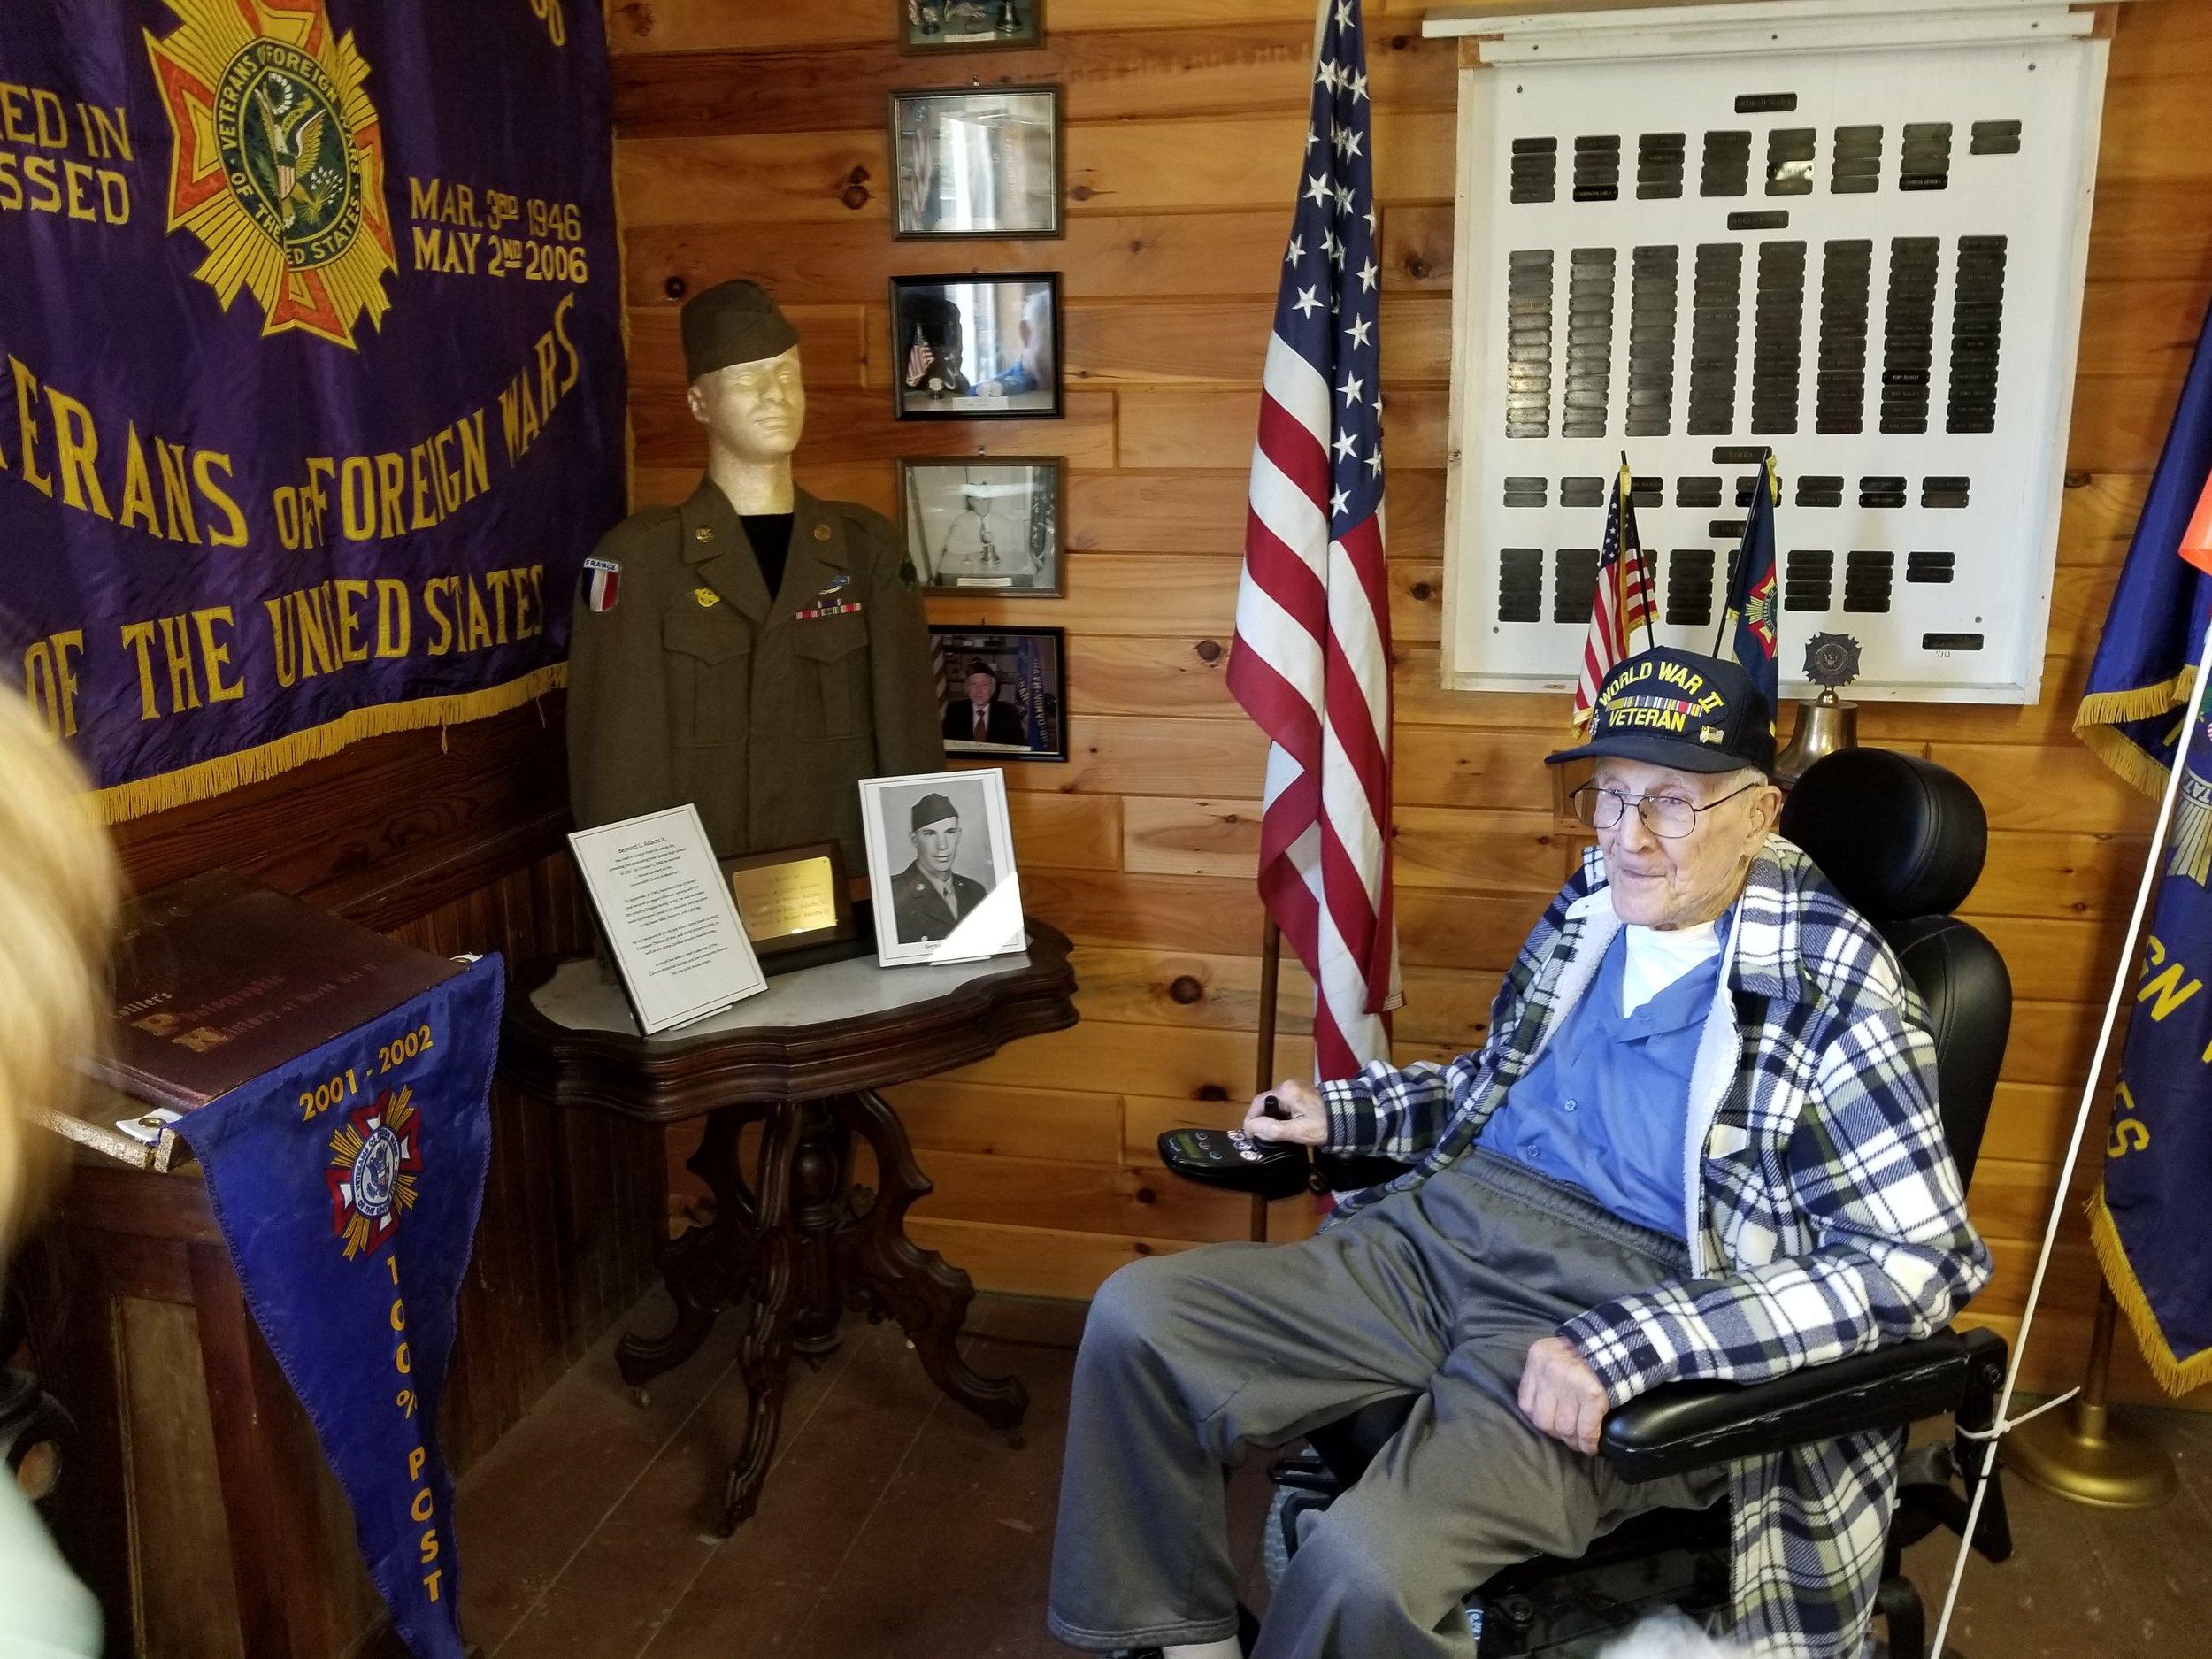 WWII Veteran Bernard Adams visits his exhibit in the museum room.